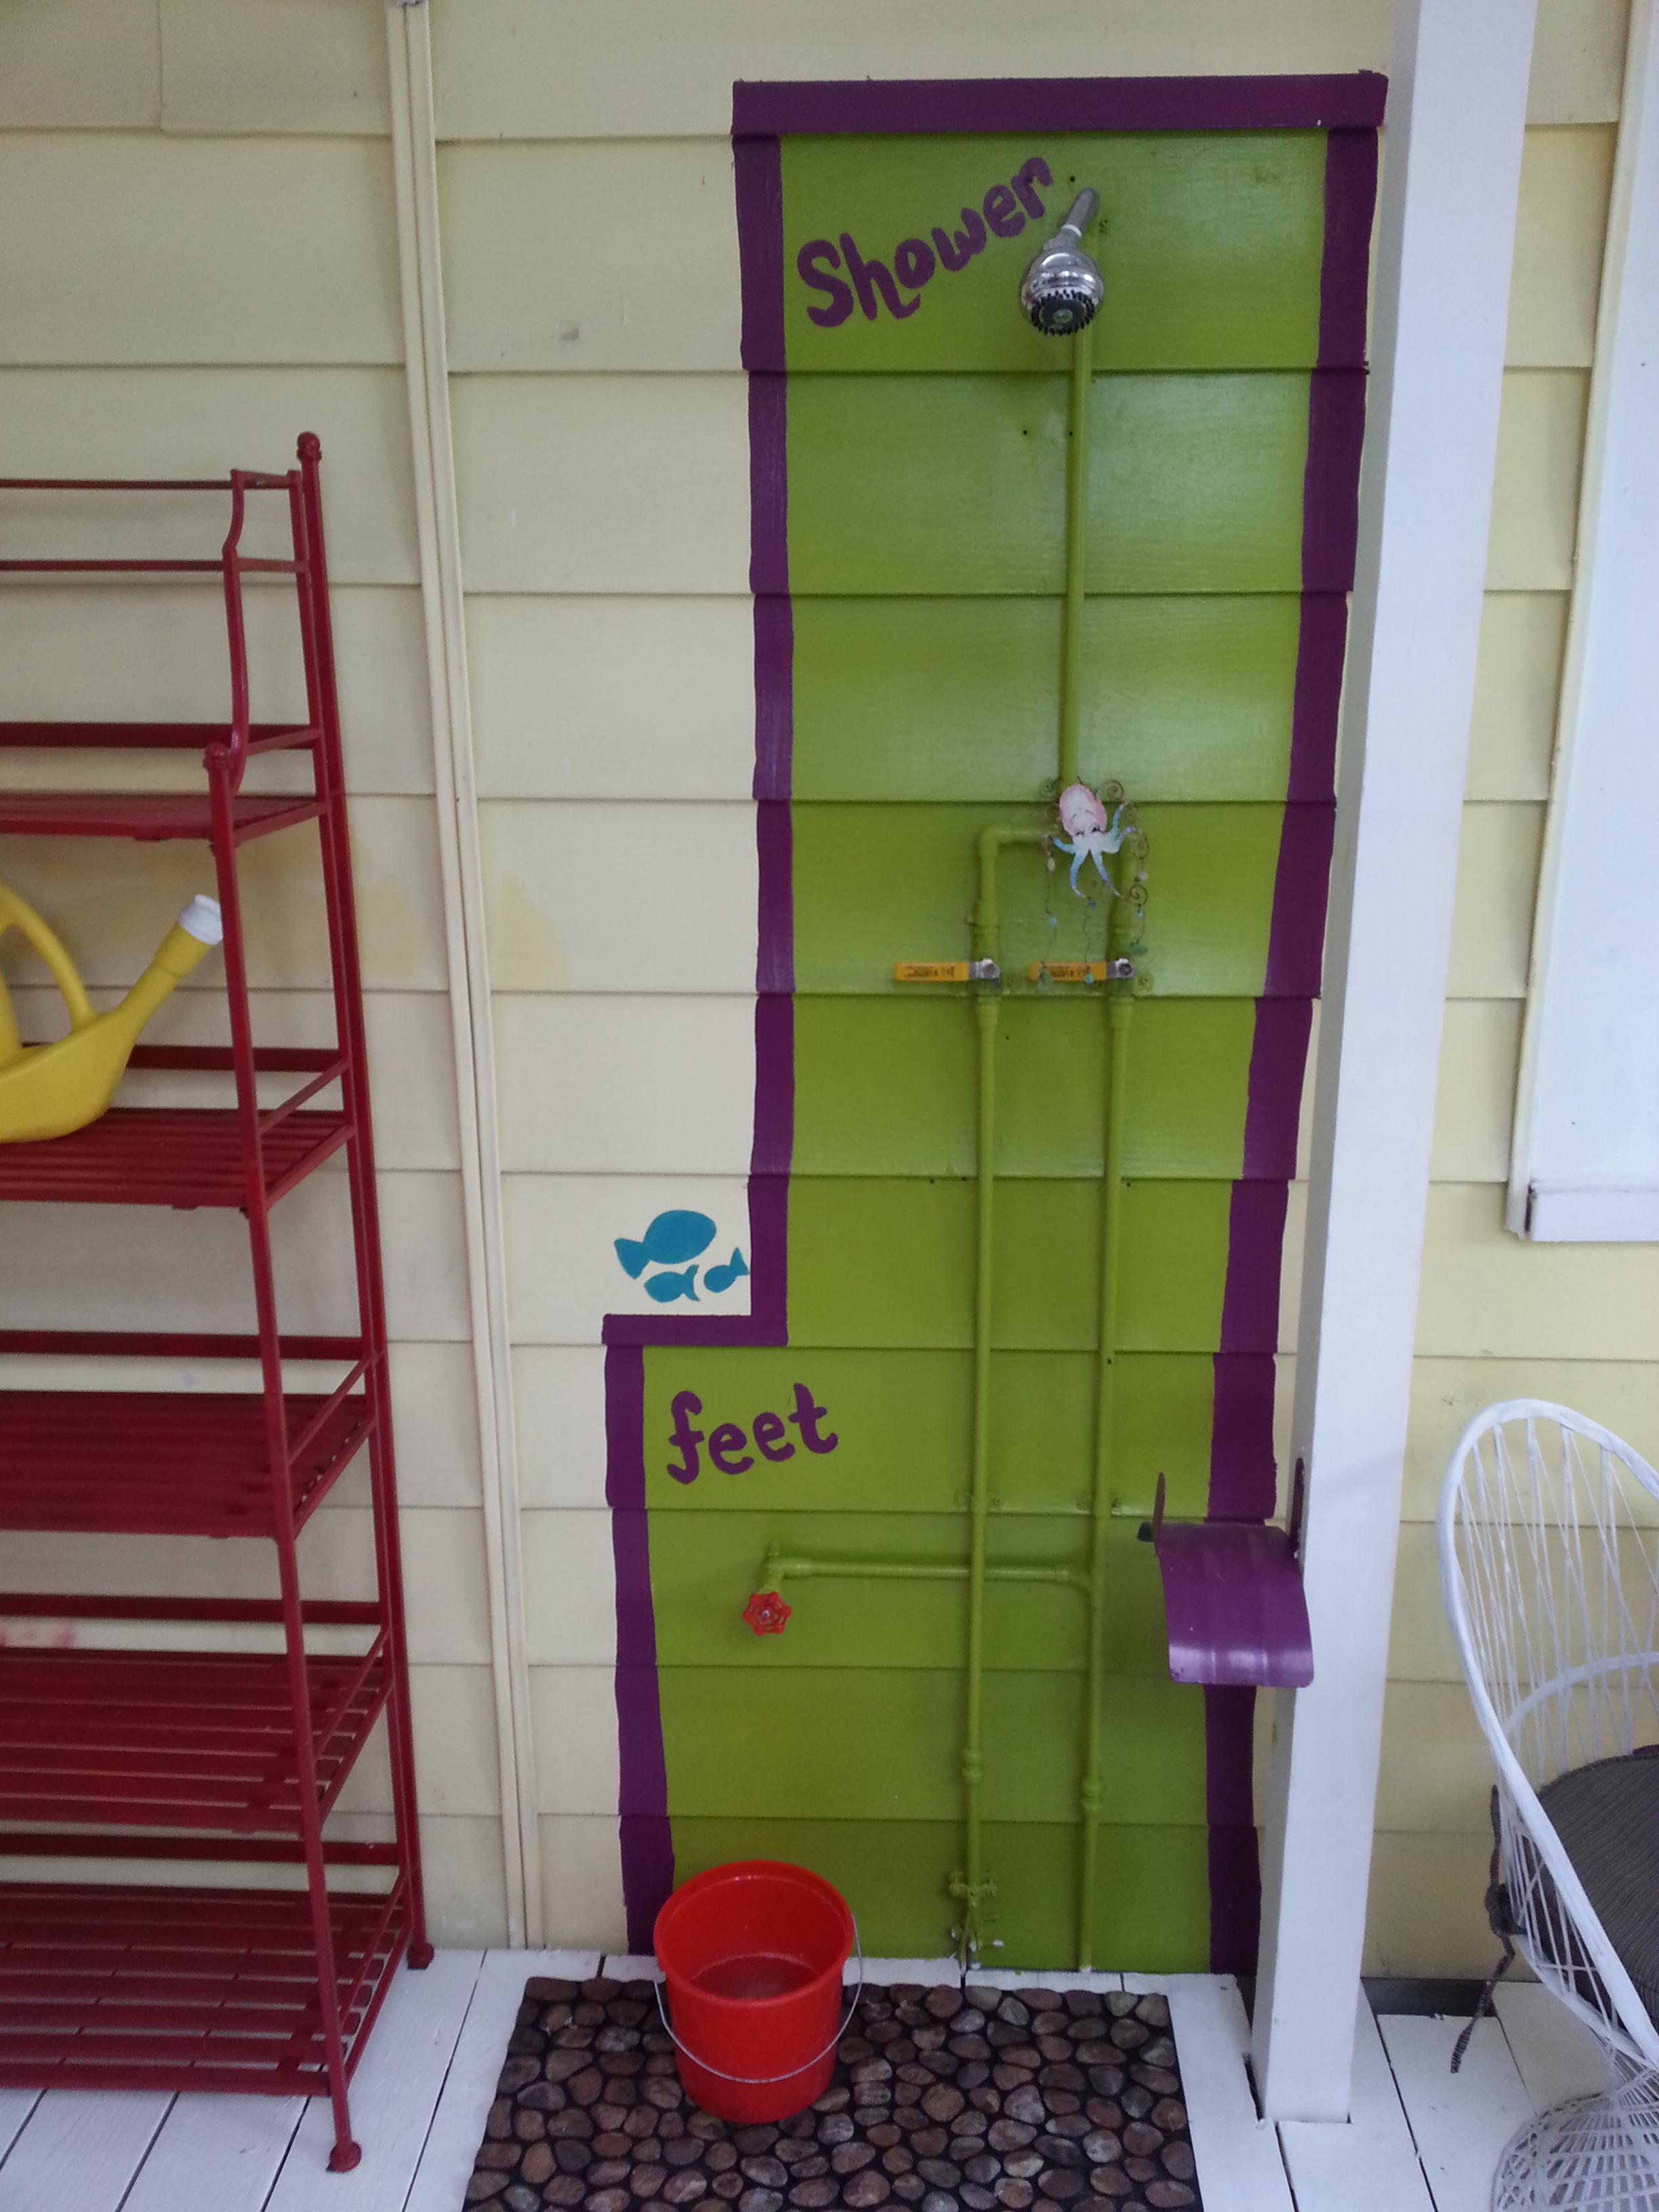 The Little Yellow Beach House u2013 Redington Shores FL Taste Adventure  Shower  Chair Walgreens Mauorel. Shower Chairs Walgreens